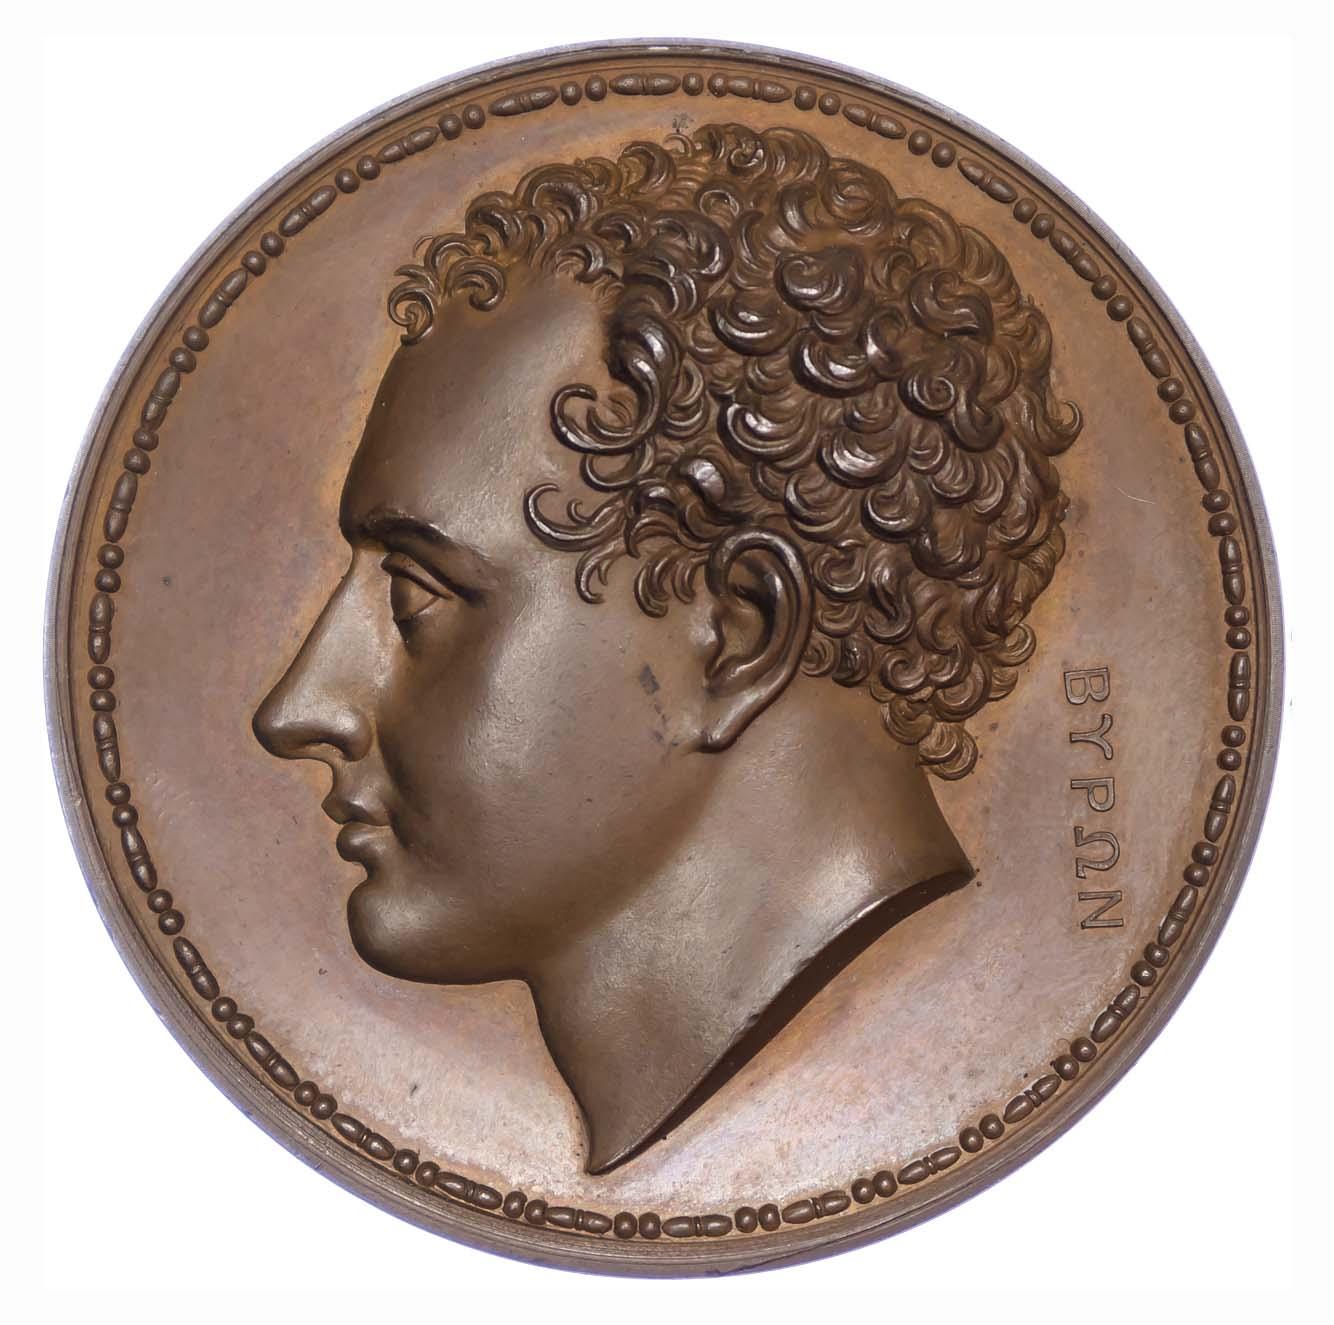 George IV, Death of Lord Byron, 1824, Copper Medal